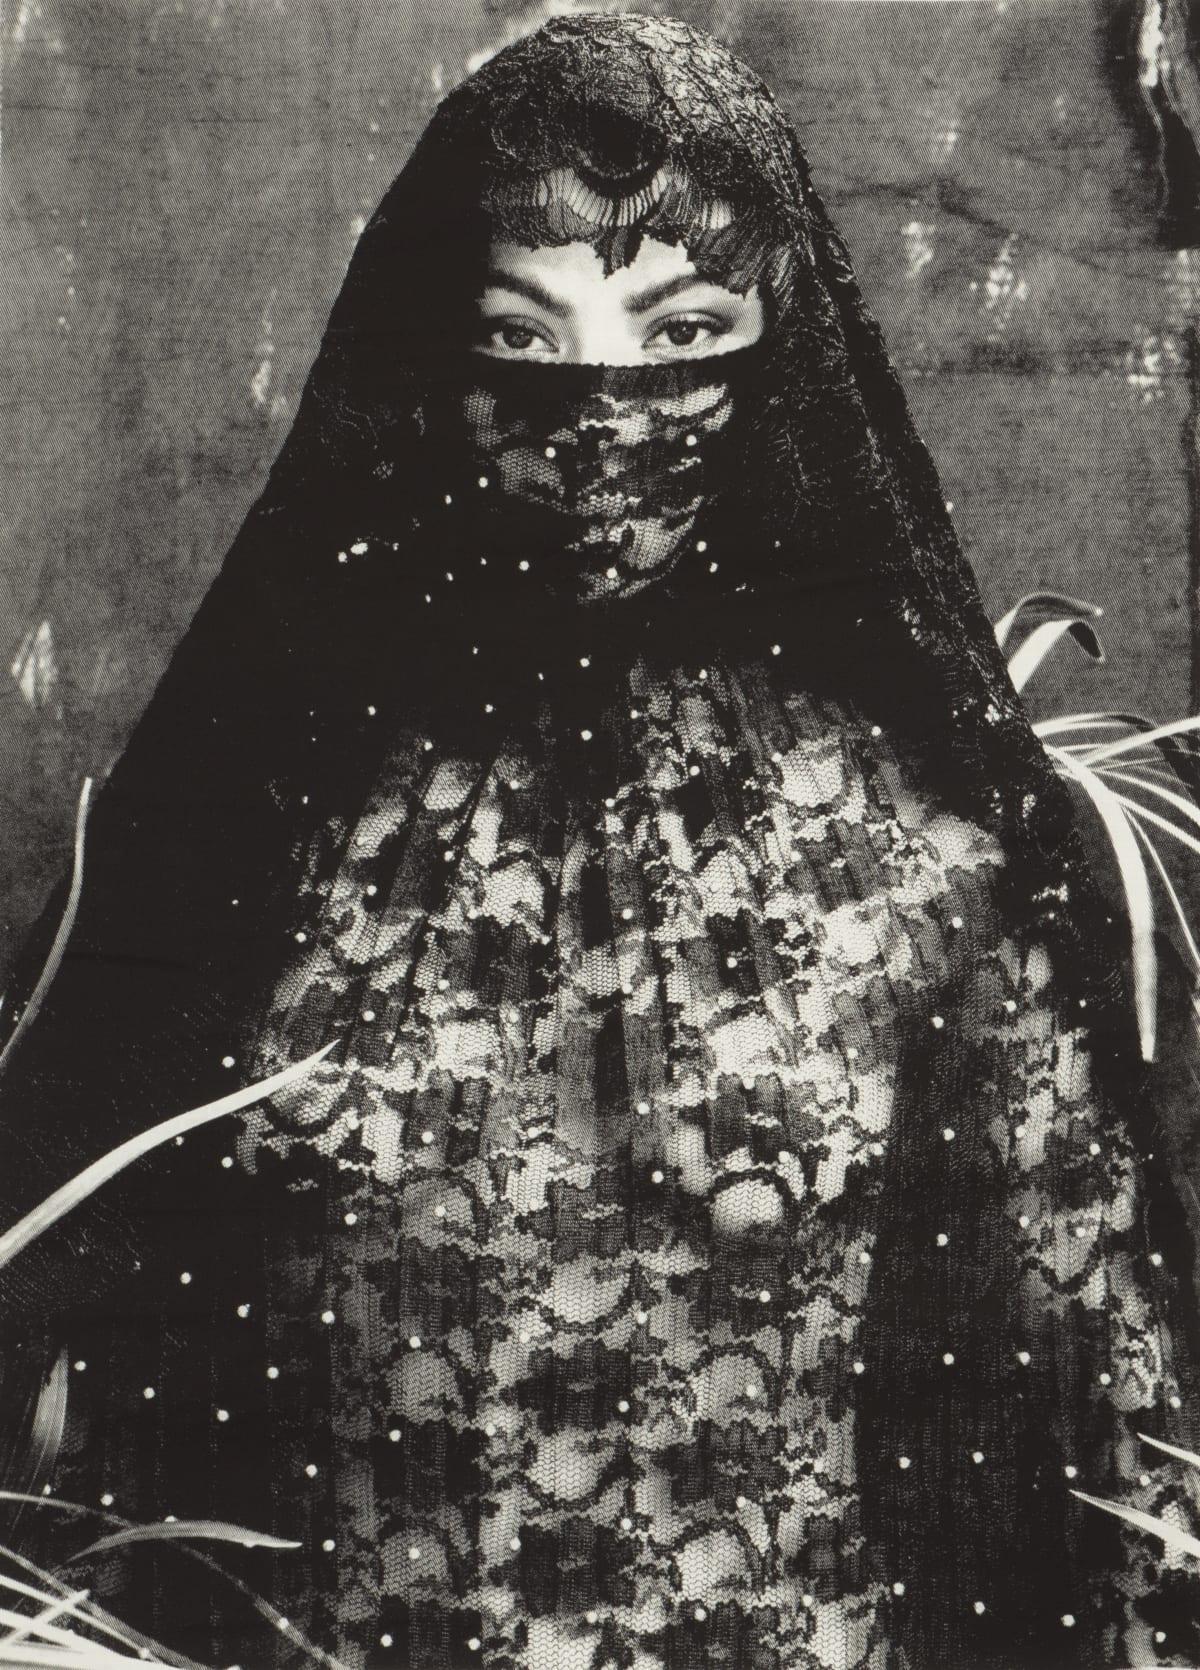 Zohra Opoku, Undercover, 2017